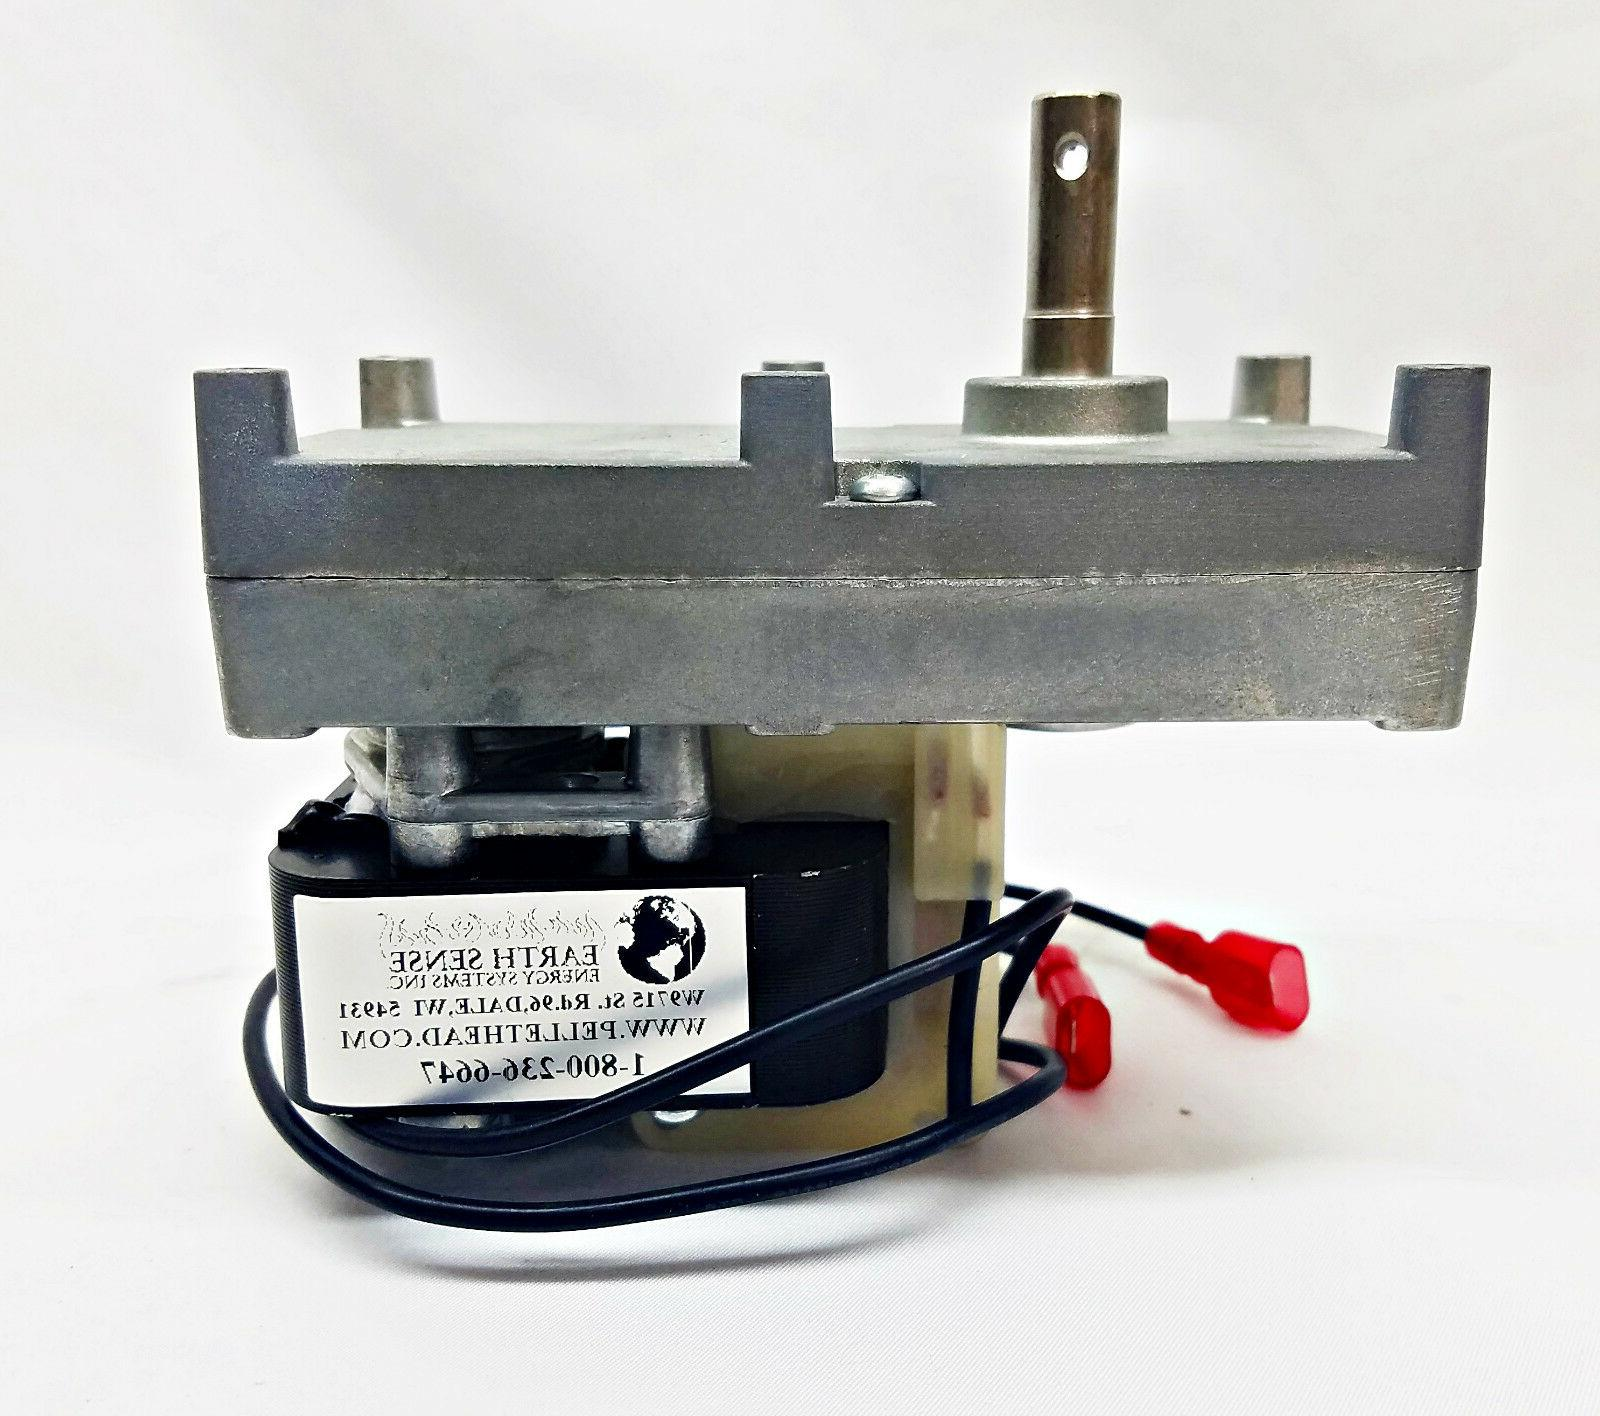 englander pellet stove auger feed motor 1